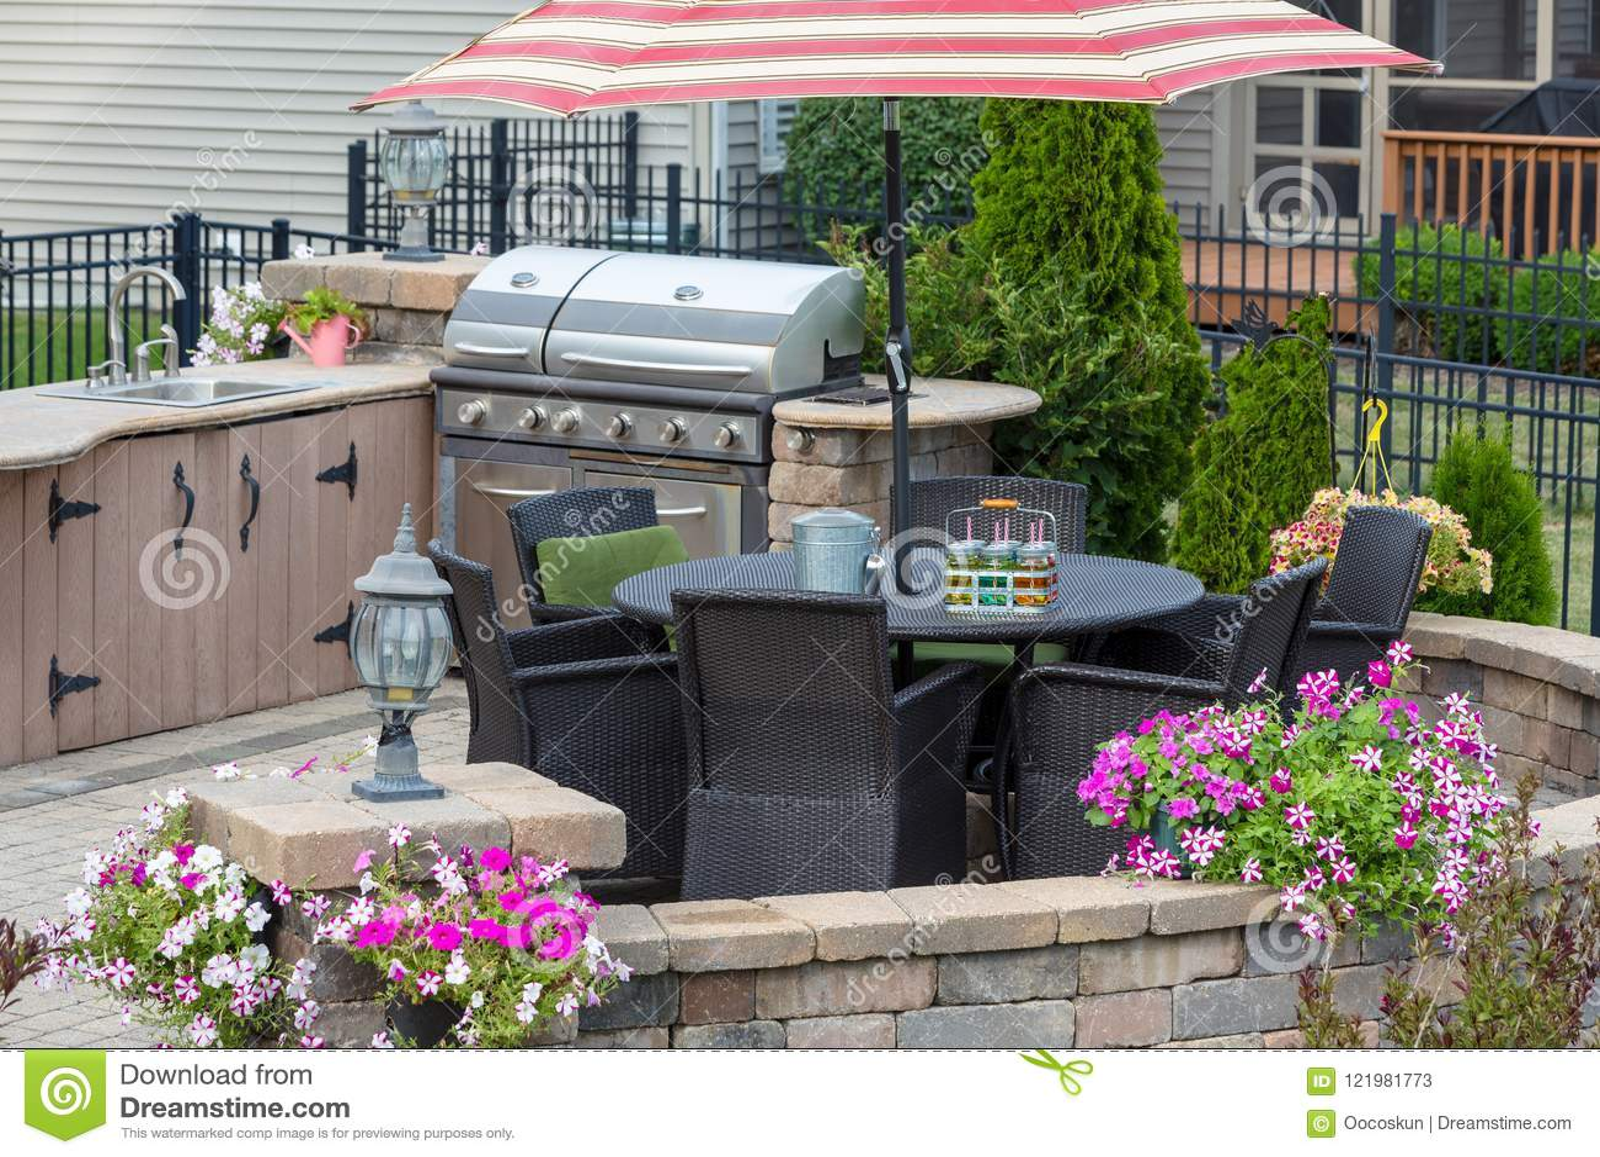 patio kitchen suppy 砖外部露台的室外厨房库存图片 图片包括有柠檬水 具体 家具 庭院 一个砖外部露台的室外厨房有用餐椅子的柳条的在一个伞和五颜六色的夏天下在圆墙壁上开花